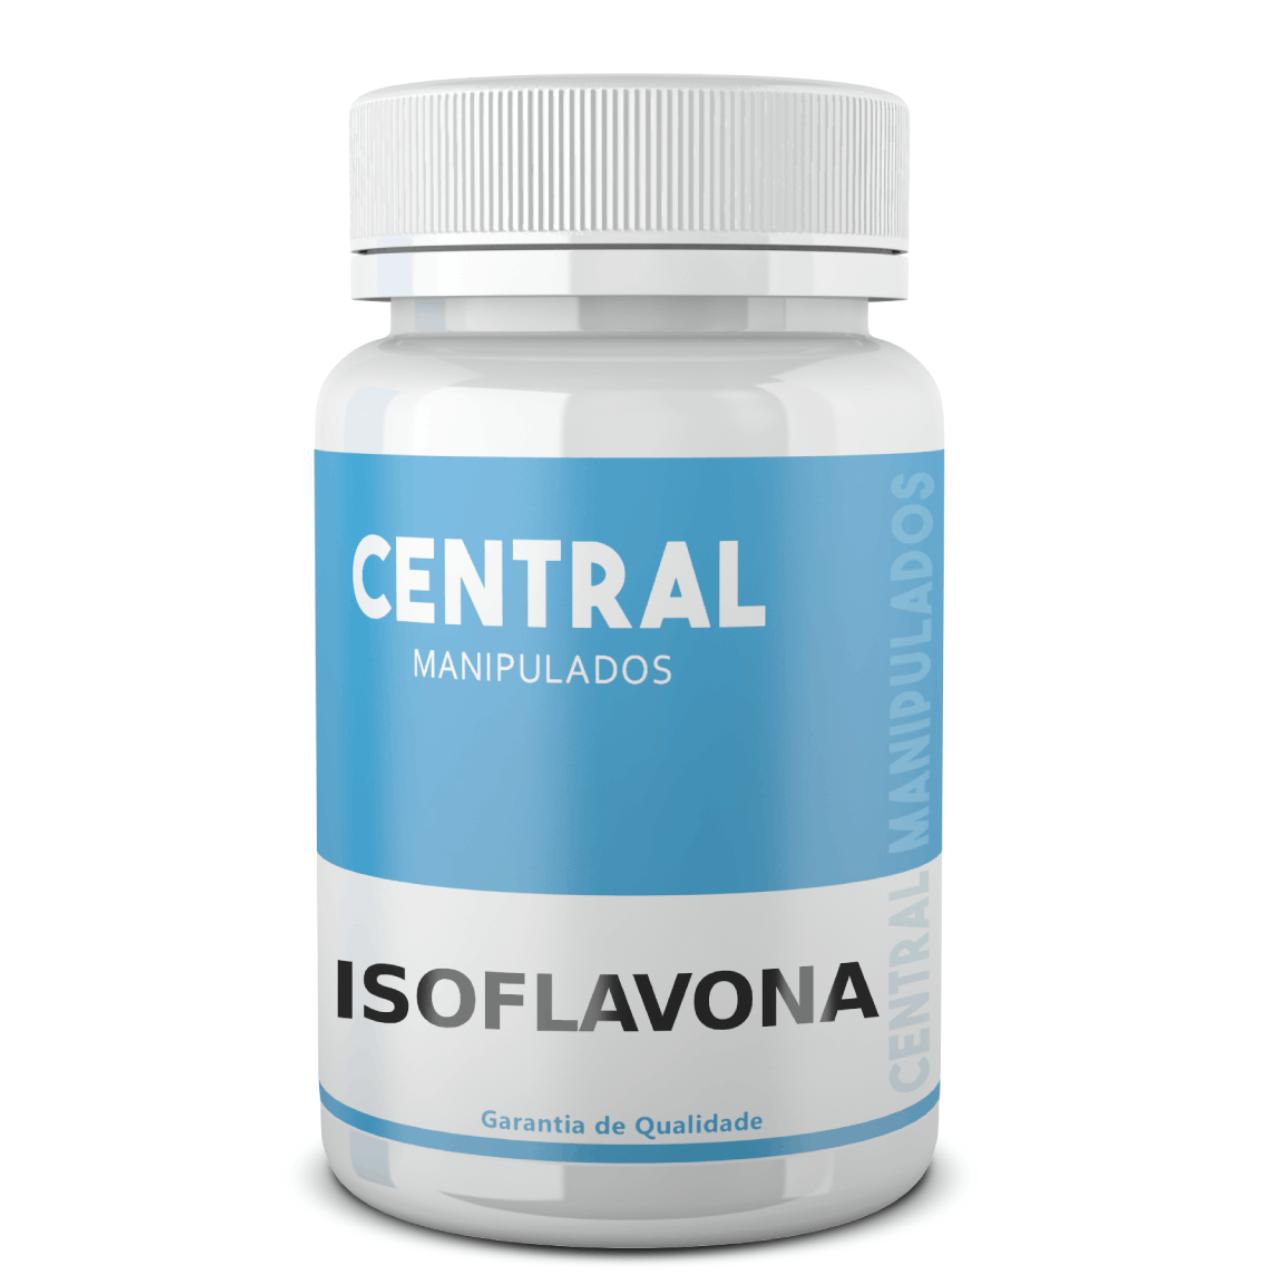 Isoflavona 8mg - 120 Cápsulas - Menopausa, protetor de osteoporose câncer de mama, de útero, e endometriose.